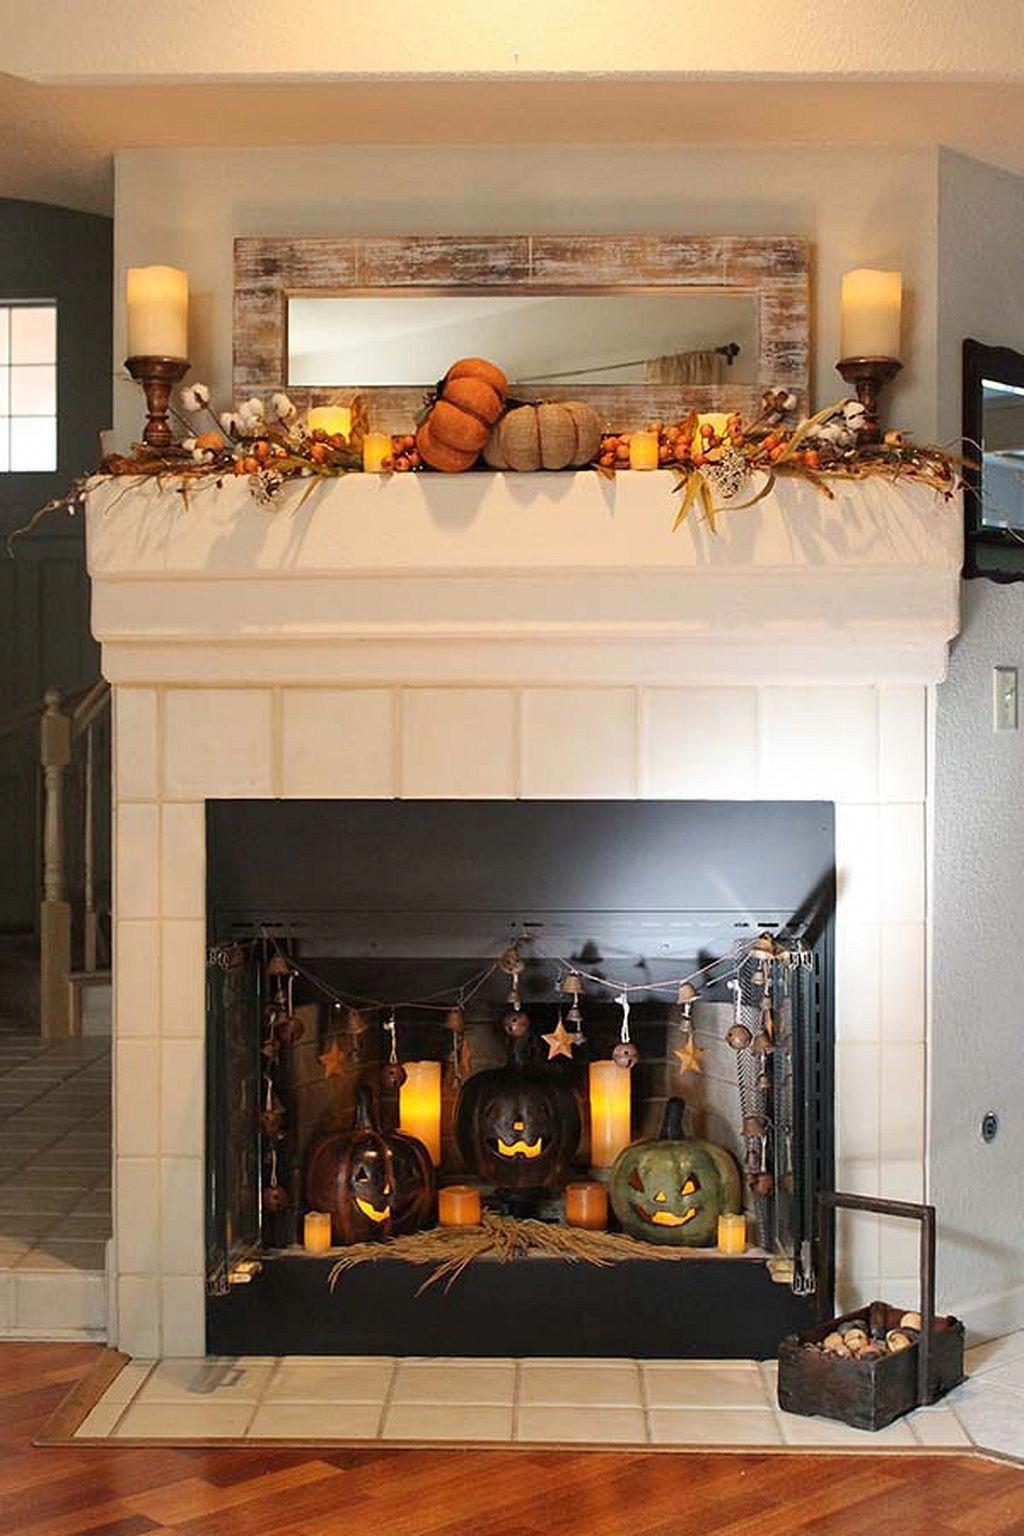 burgandydecorlivingroom burgandy decor living room in 2019 fall rh pinterest com